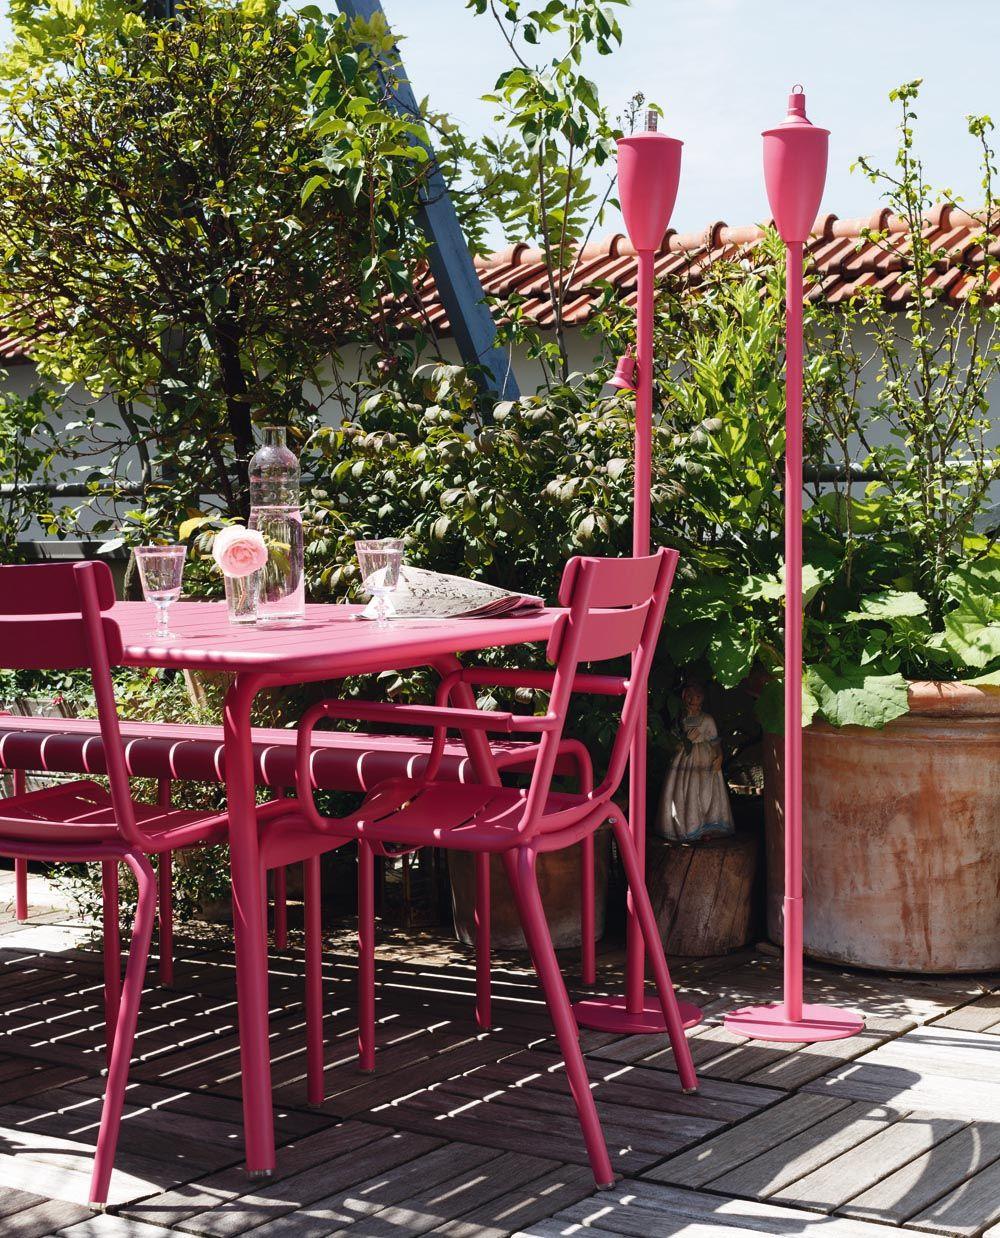 Terrasse avec table et chaises #Luxembourg couleur #rose #Fuchsia ...